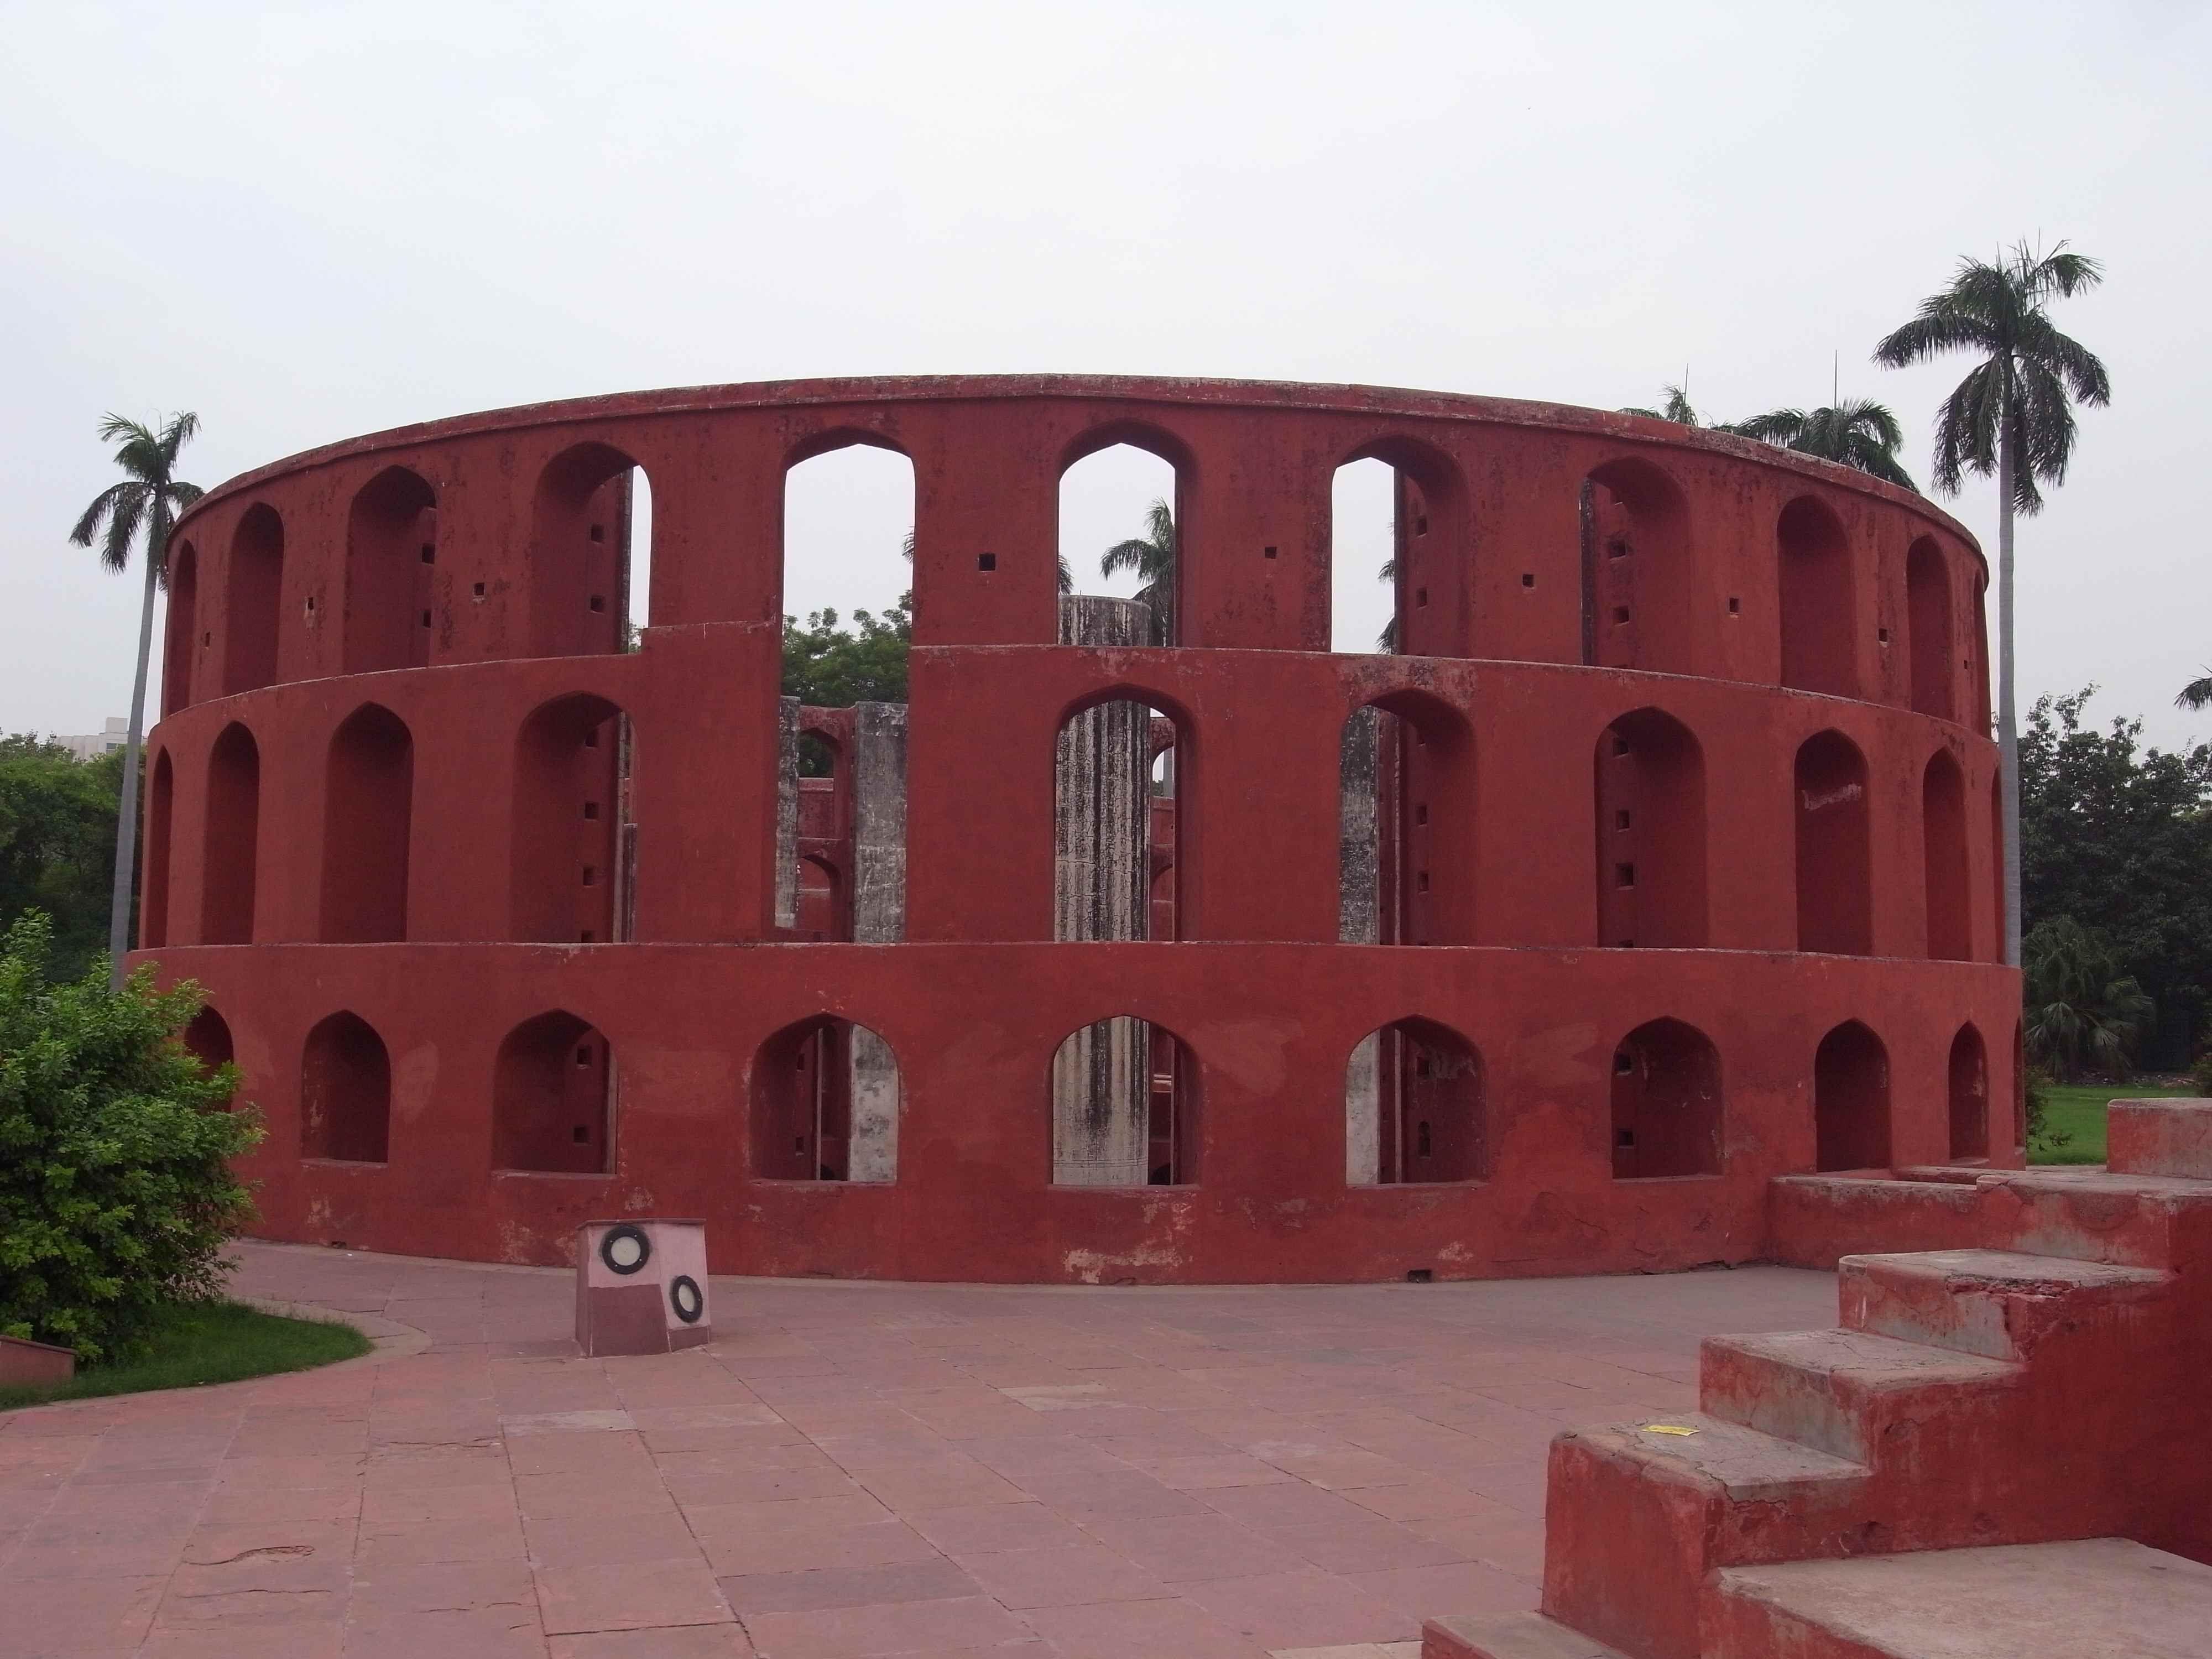 Jantar Mantar, Delhi / India